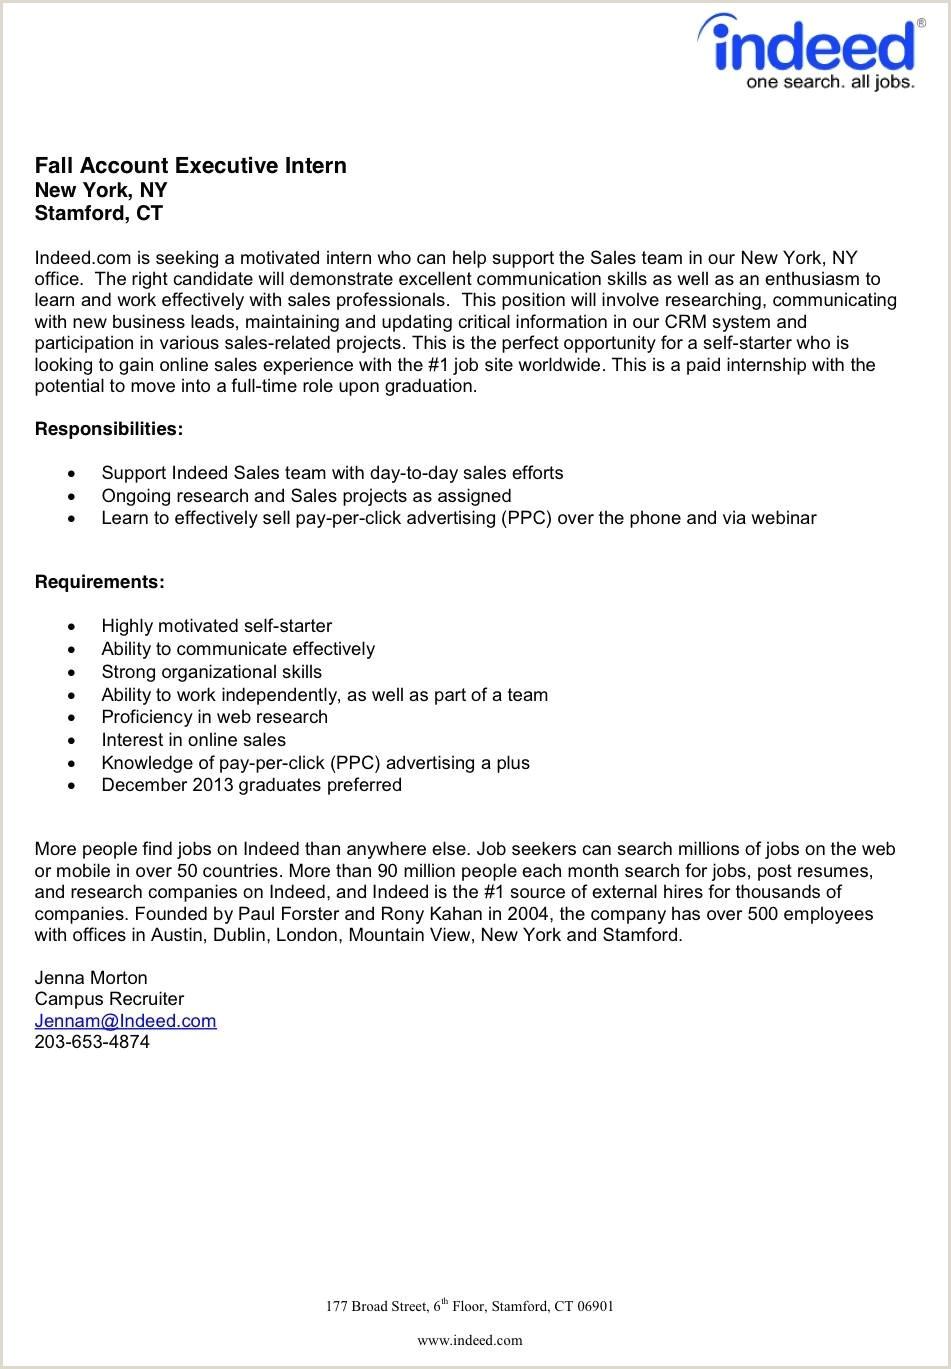 Digital Advertising Cover Letter New Curriculum Vitae Cover